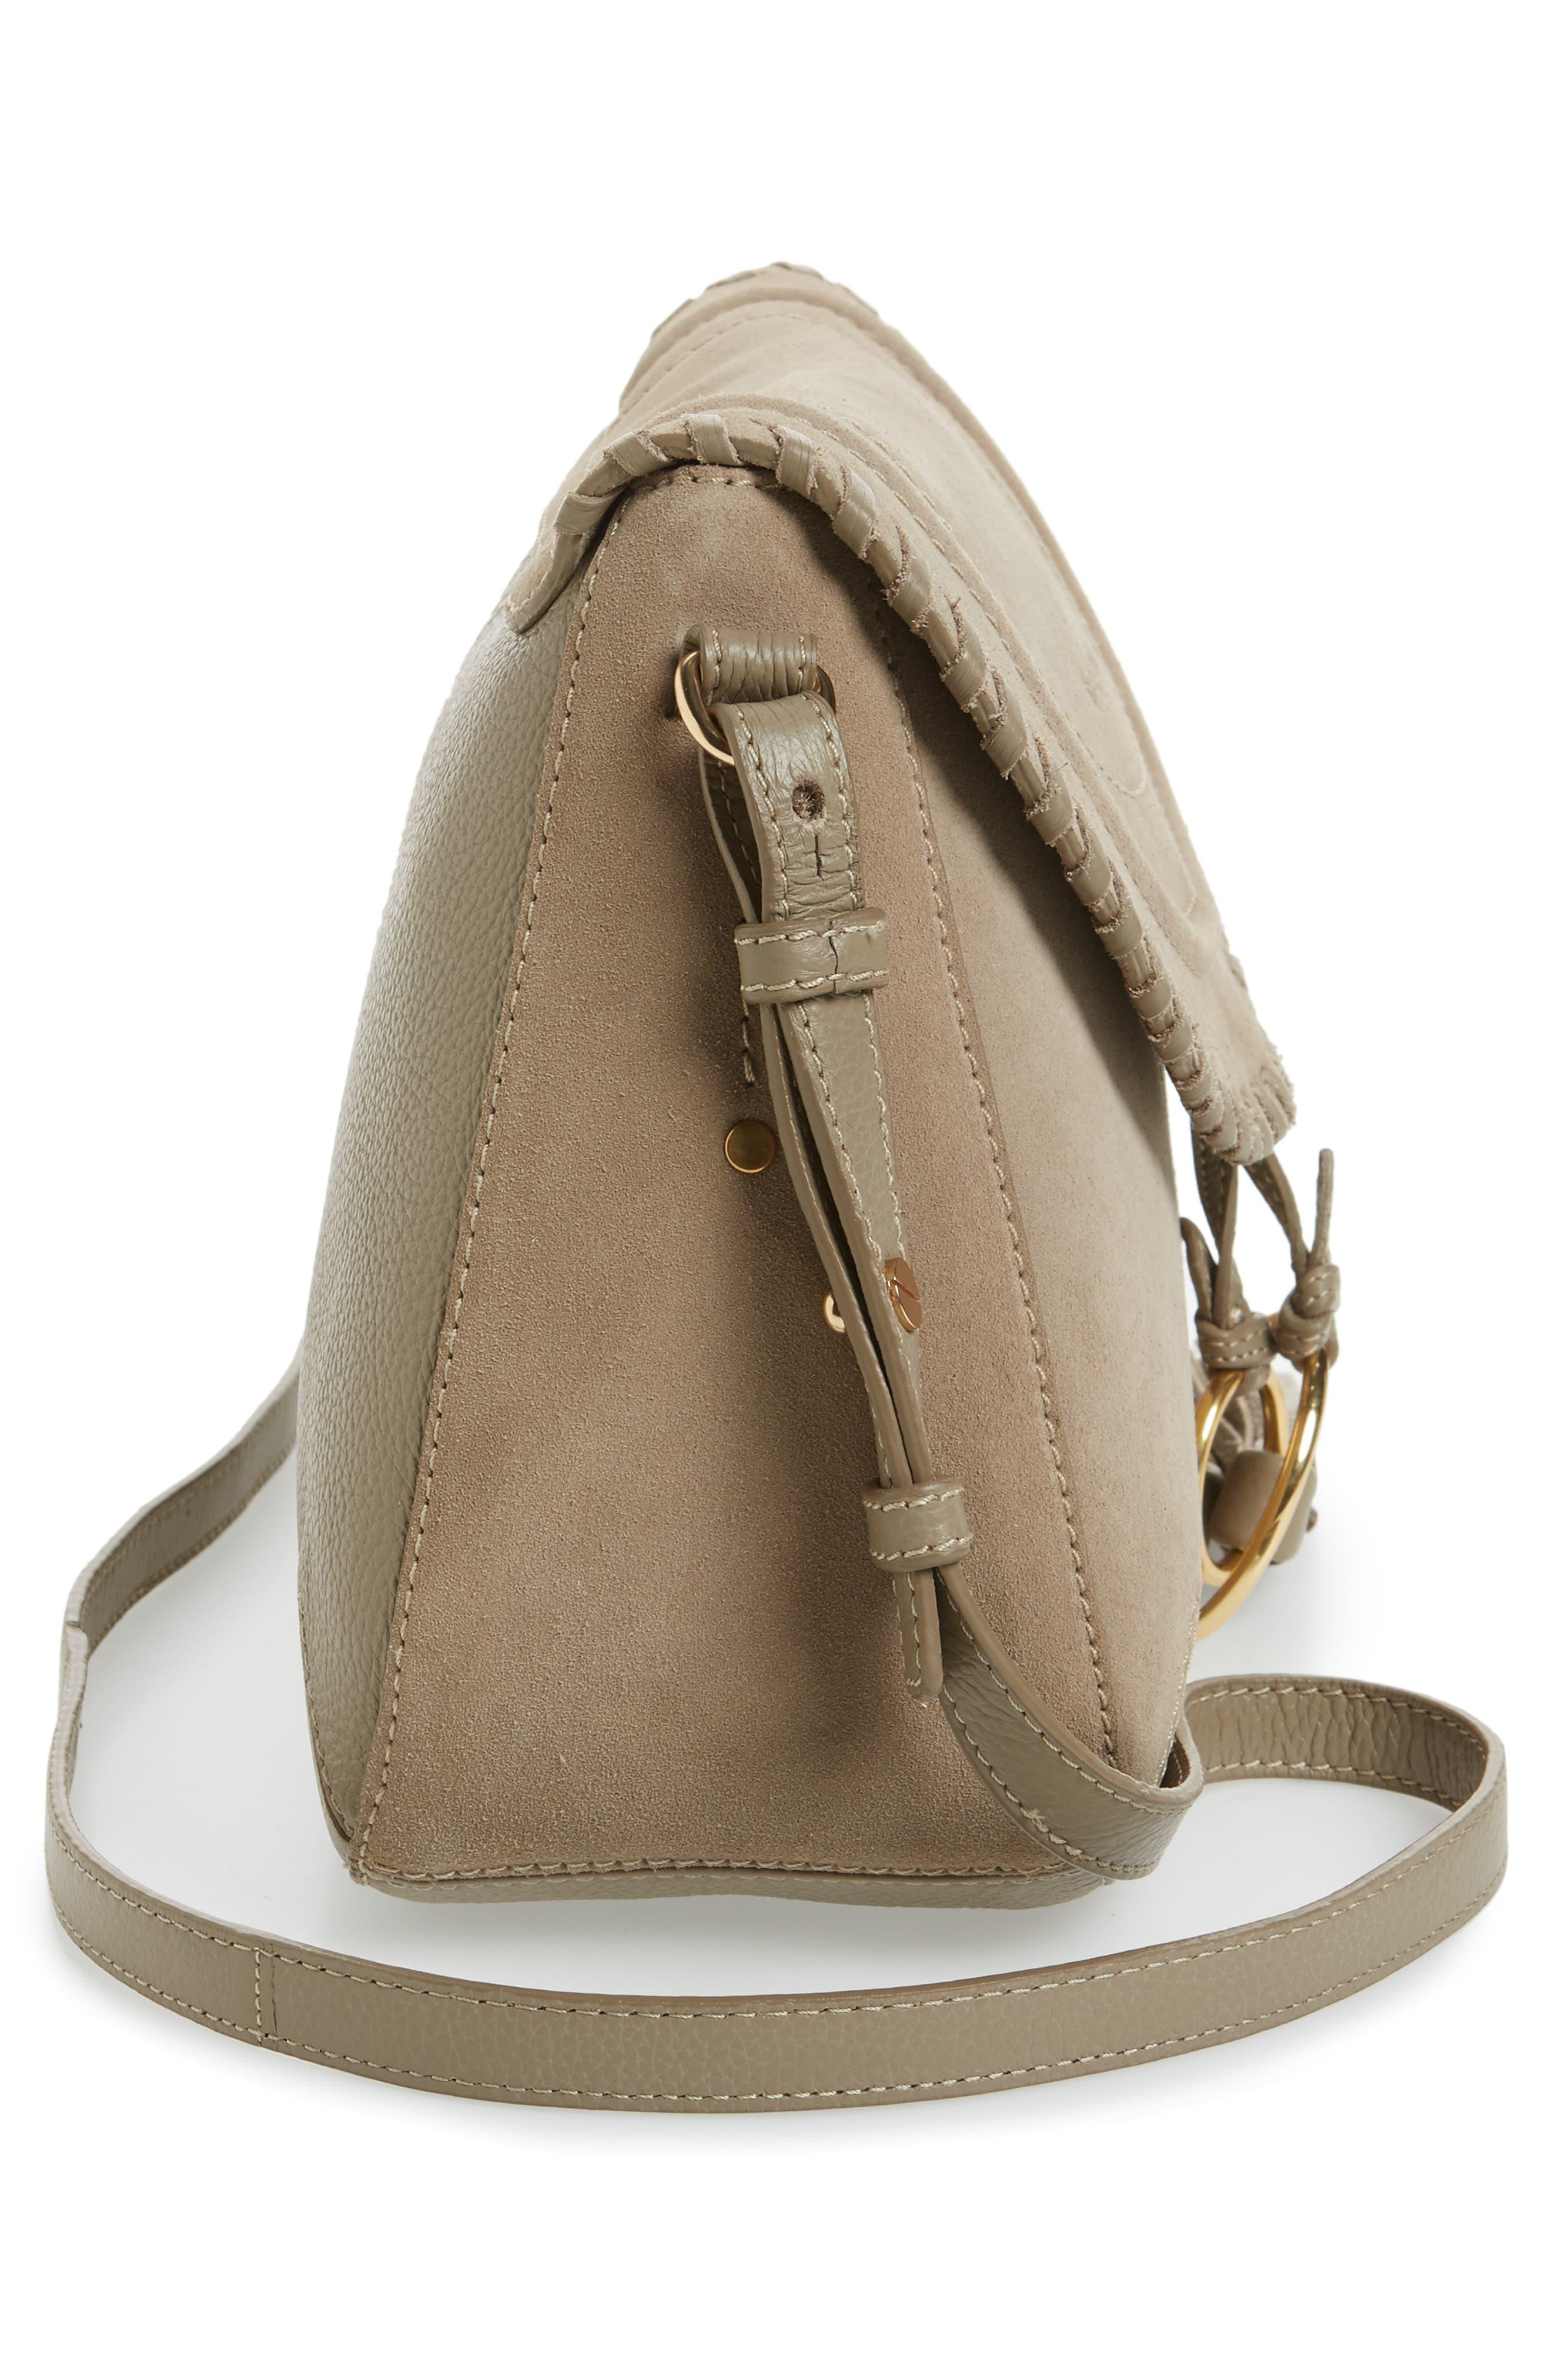 Polly Crossbody Bag,                             Alternate thumbnail 5, color,                             Motty Grey